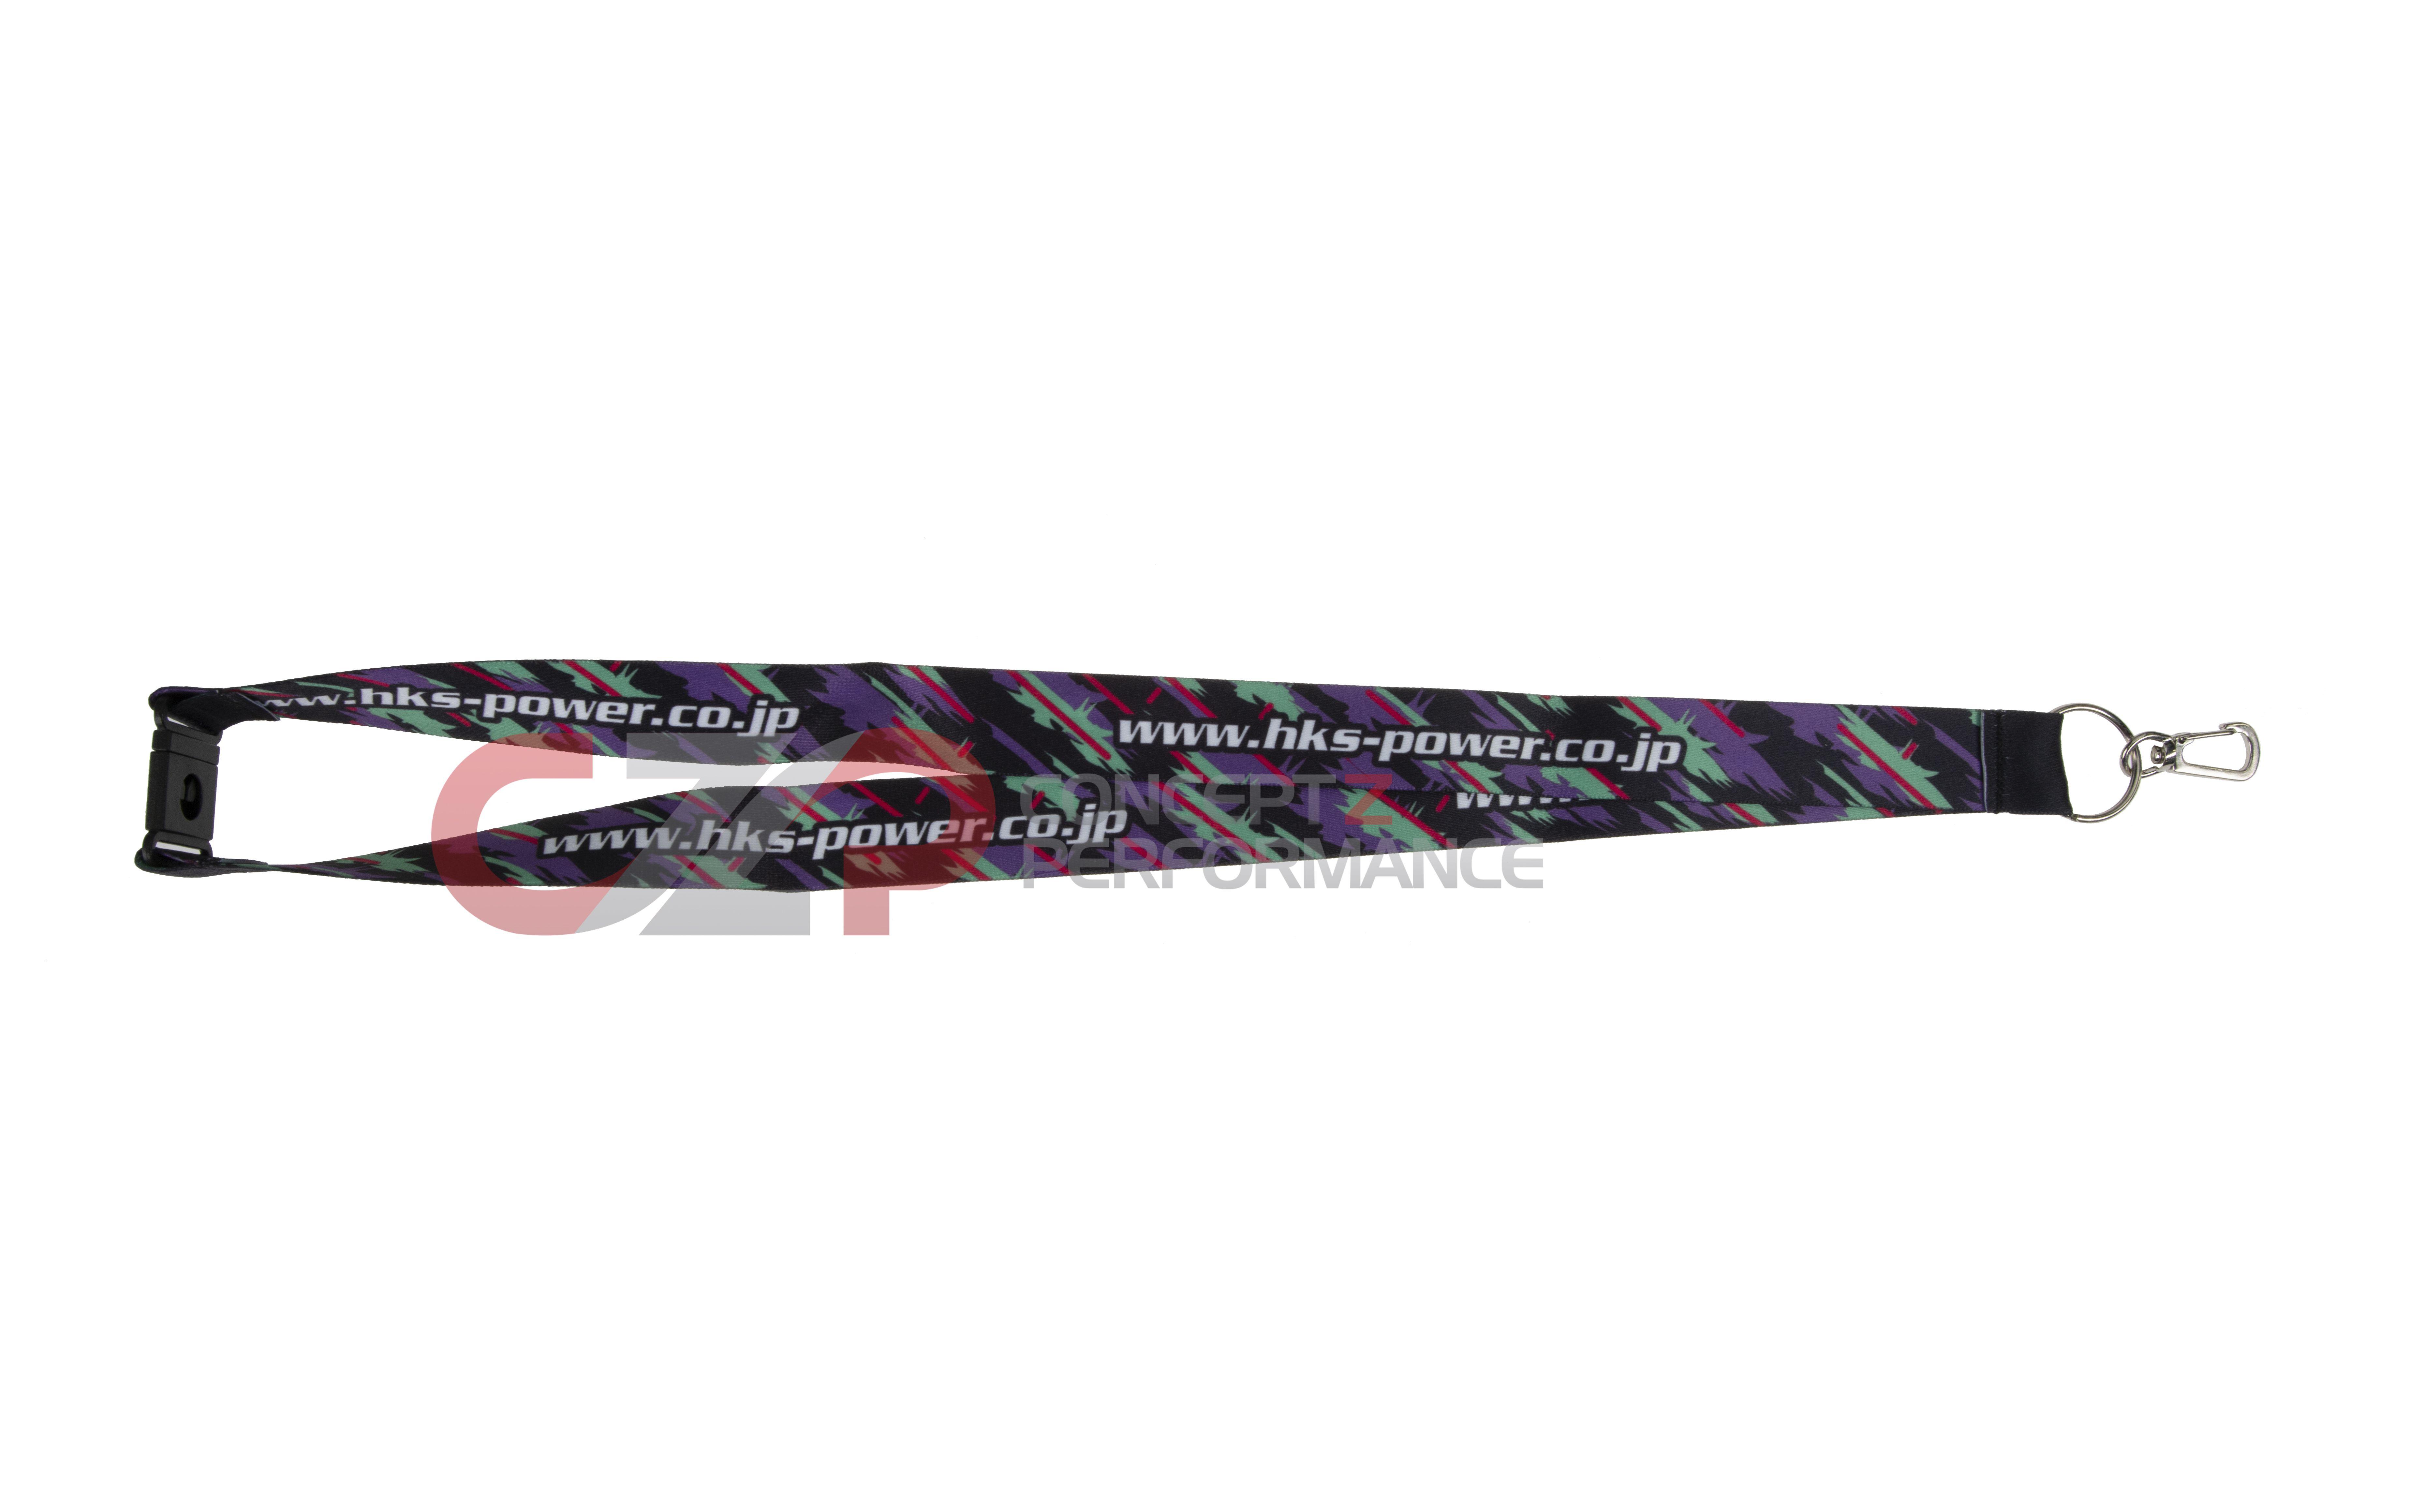 HKS 51007-AK229 Premium Goods Neck Strap Lanyard Key Chain Holder Genuine JDM